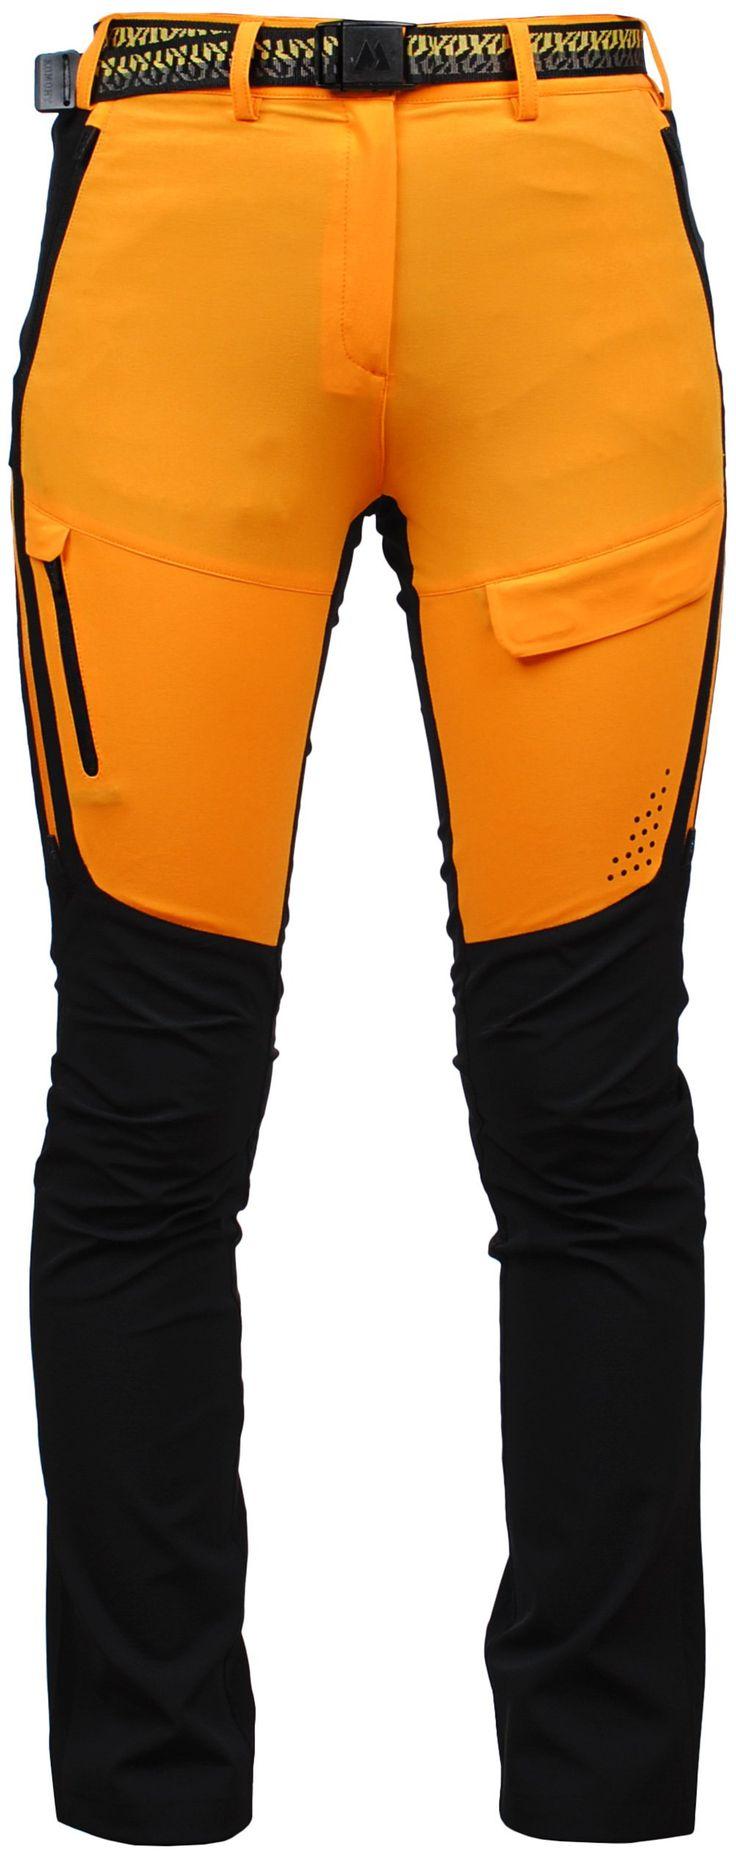 Amazon.com: Angel Cola Women's Outdoor Hiking & Climbing Softshell Pants PM5106: Clothing